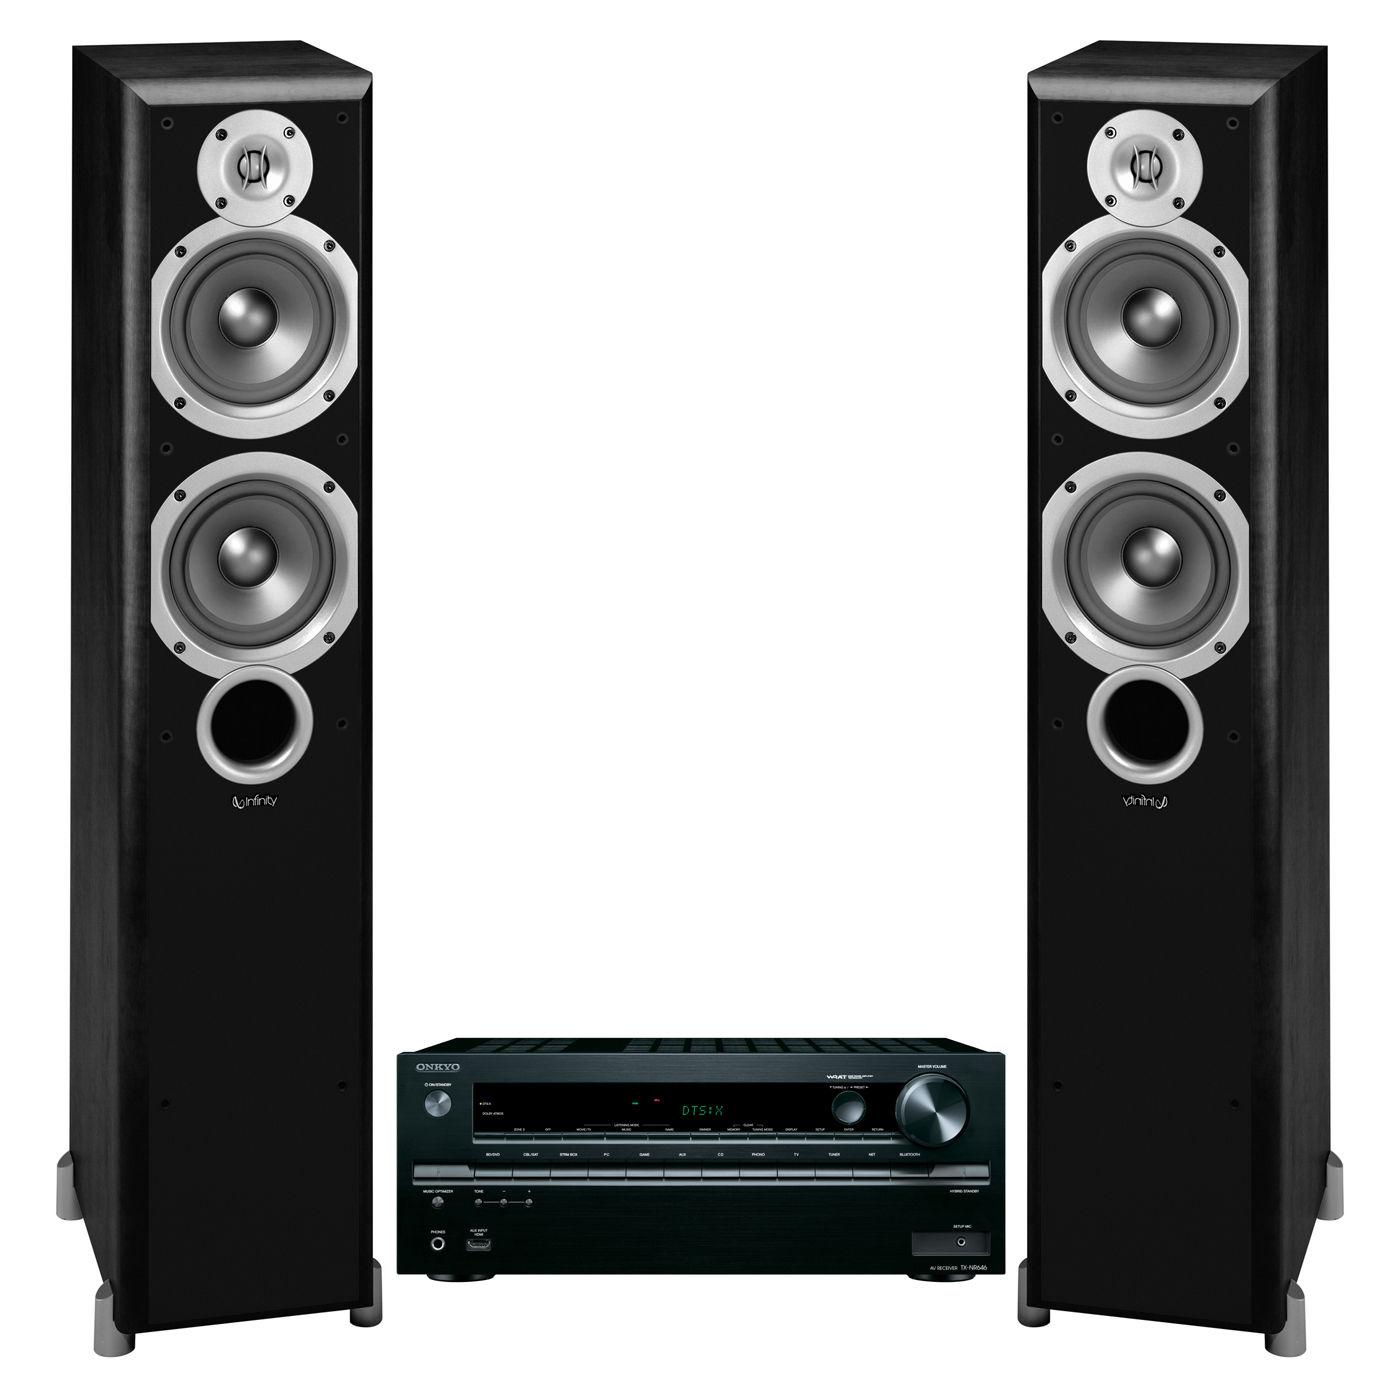 Onkyo TXNR646 7.2 Channel w/ Infinity Primus P253 Floorstanding Speakers (Black) for $499.00